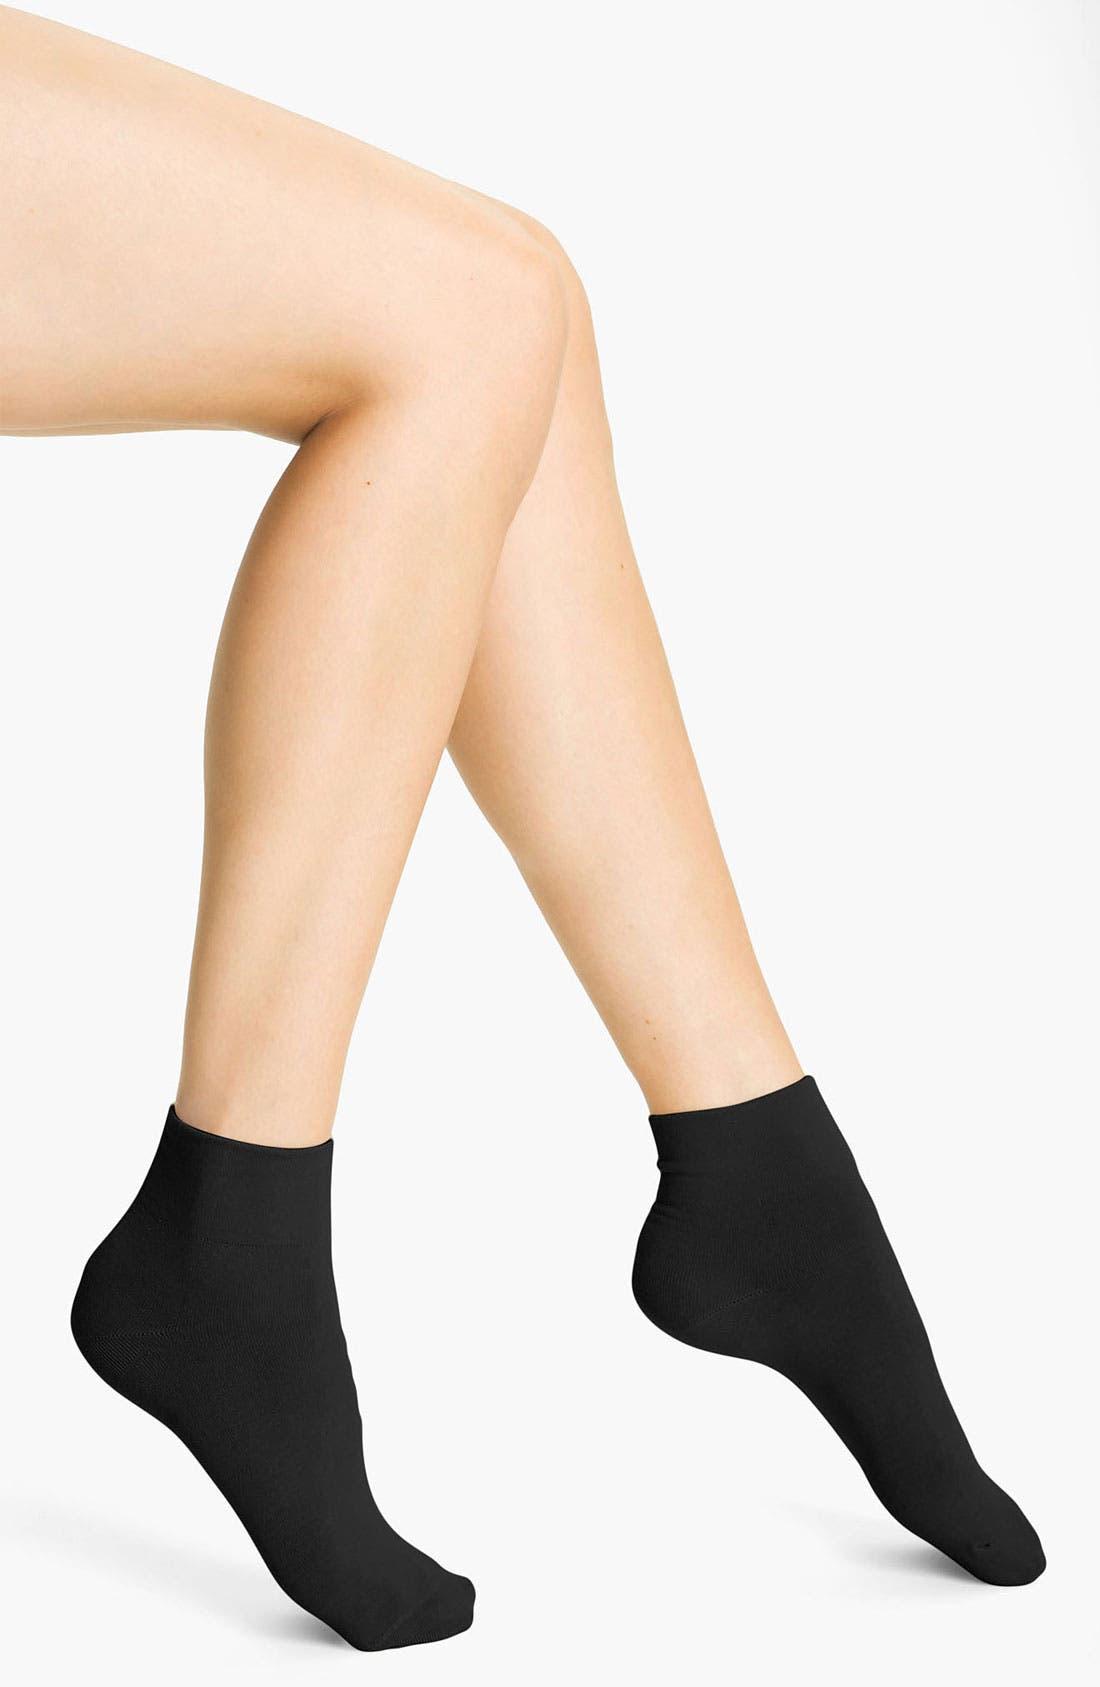 Cotton Blend Socks,                         Main,                         color, Black